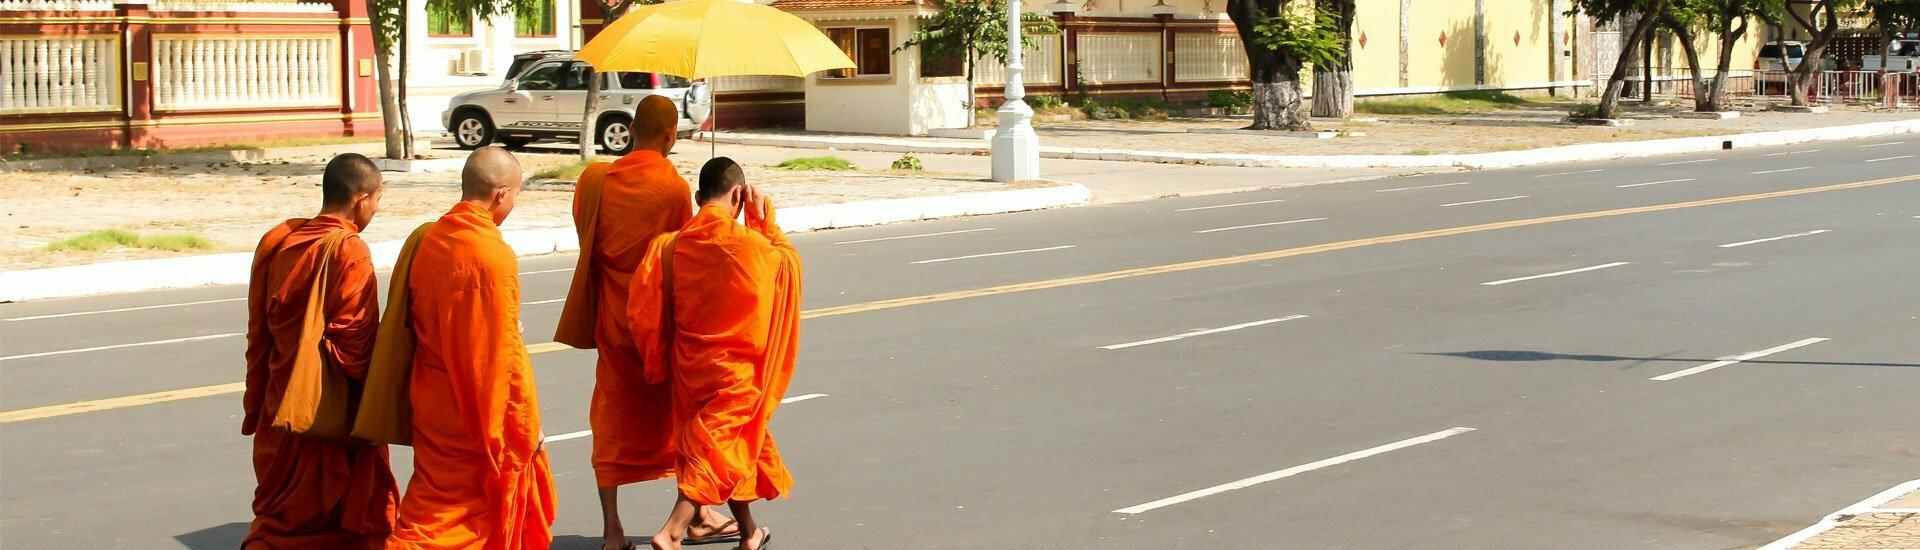 Les moines bouddhistes au Cambodge